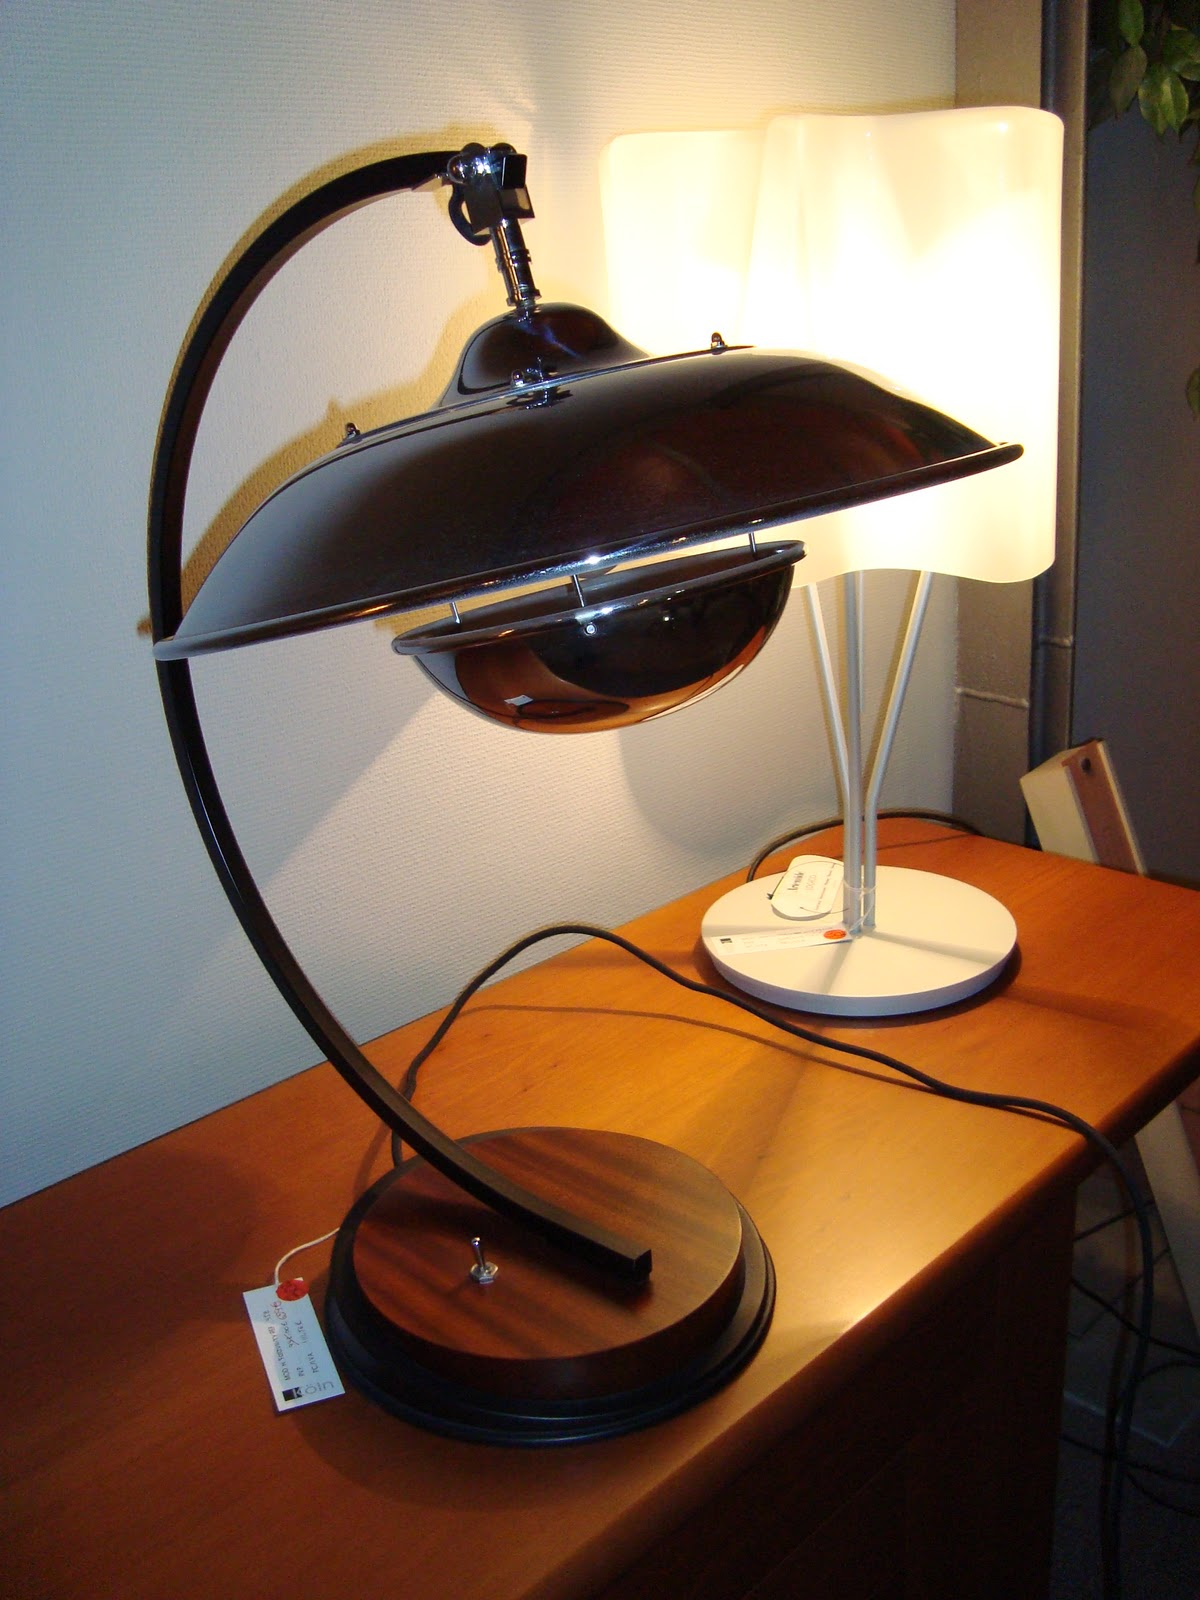 Liquidacion muebles de dise o iluminacion - Iluminacion muebles ...